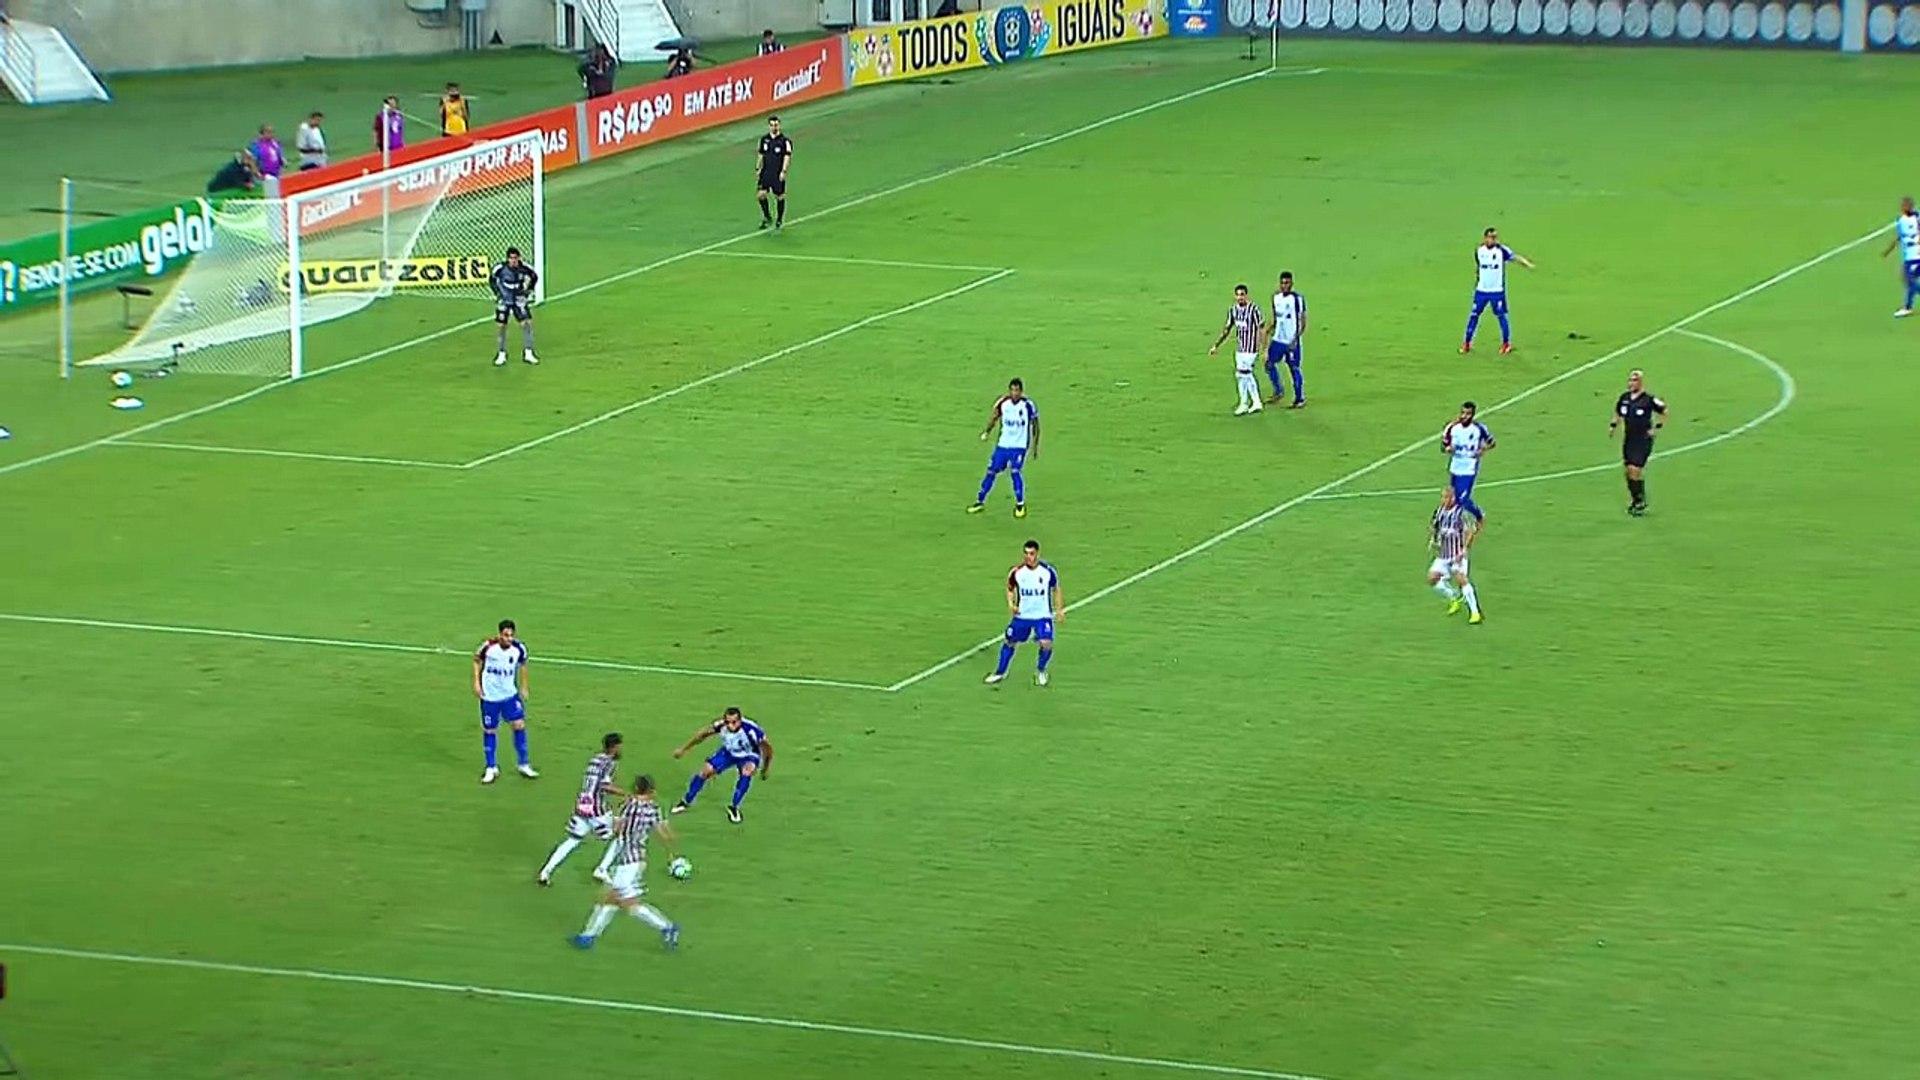 [GOL DE RICHARD] Fluminense 4 x 0 Paraná - Série A 2018